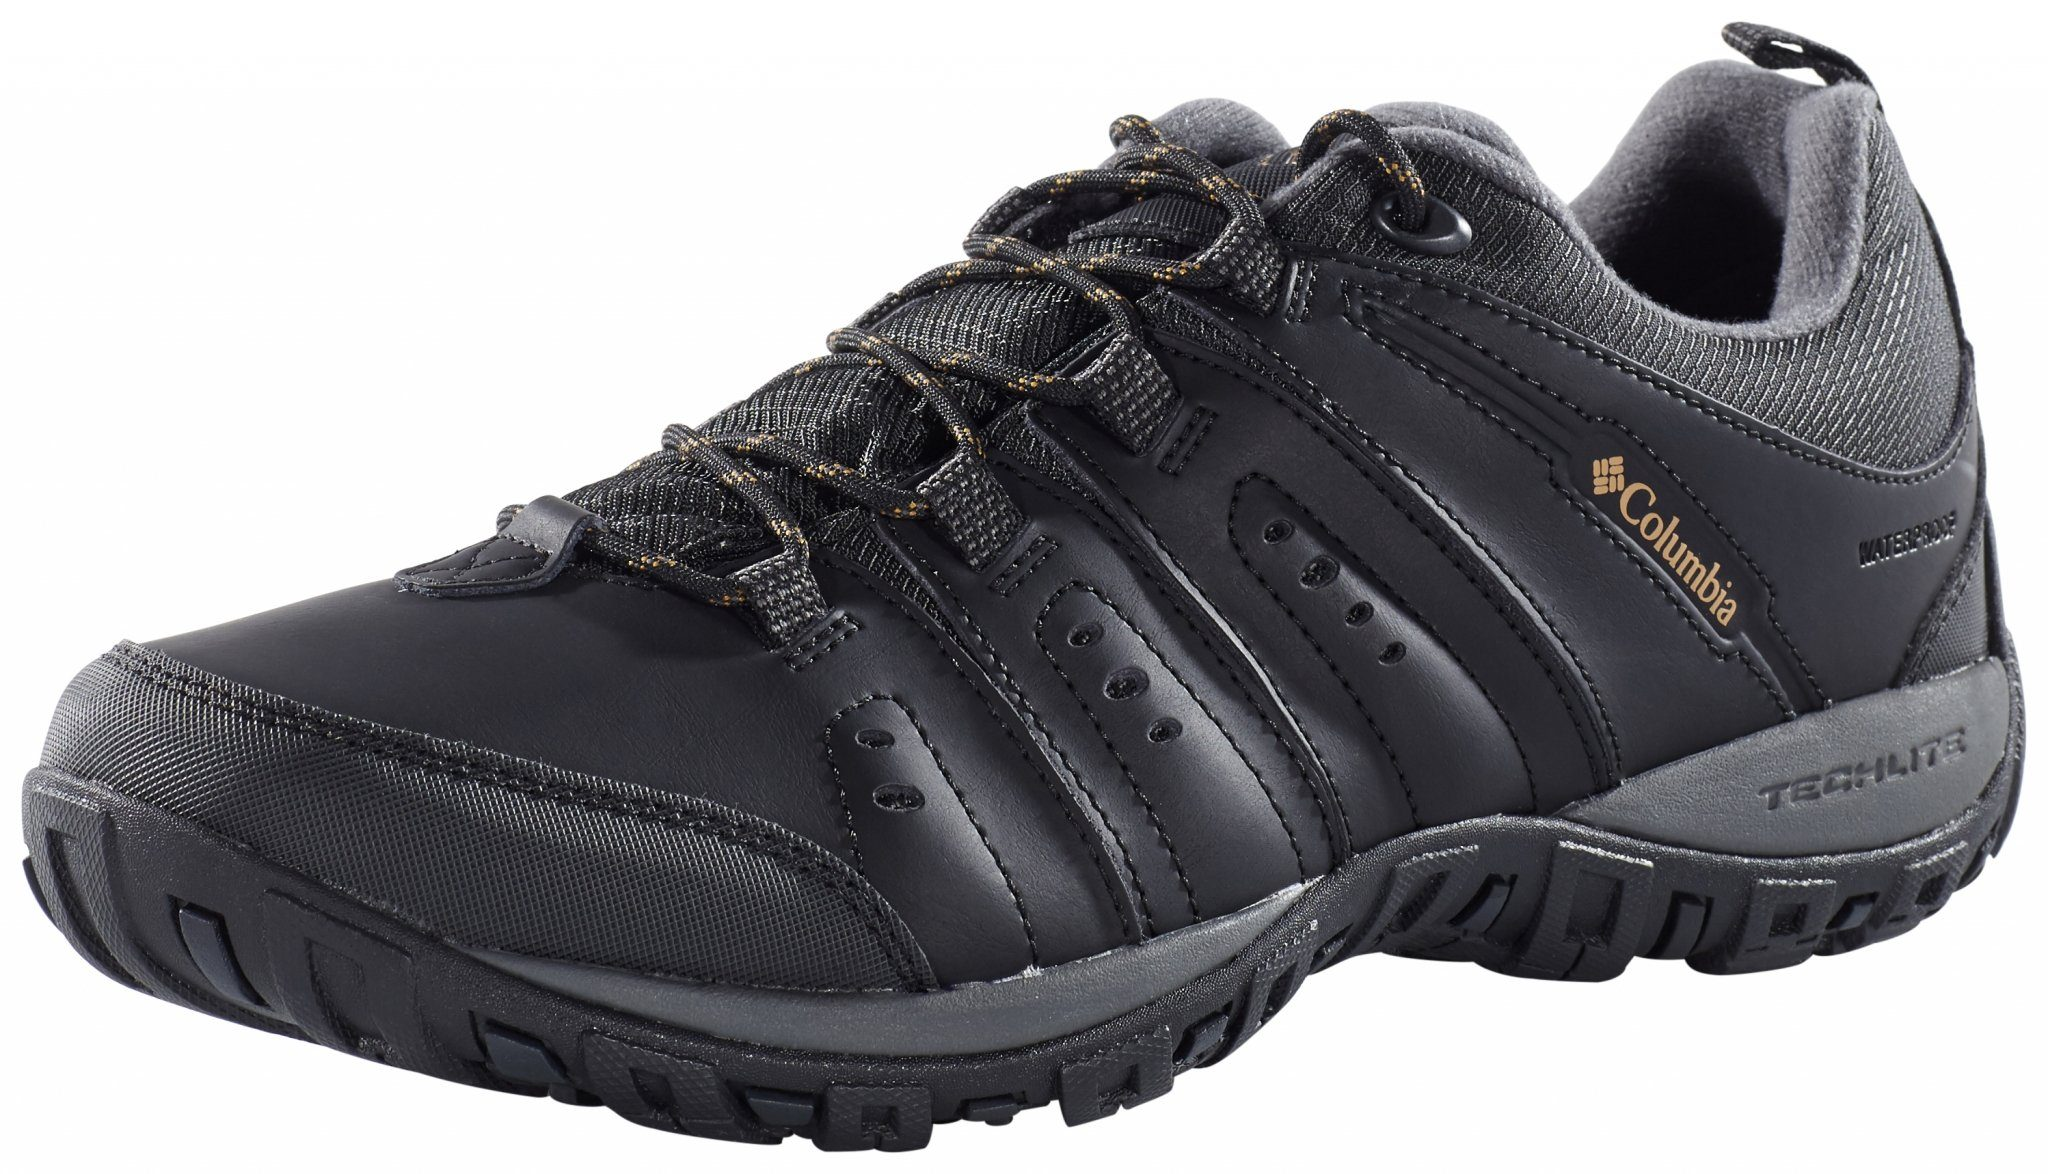 Columbia Kletterschuh »Peakfreak Nomad Shoes Men Waterproof«